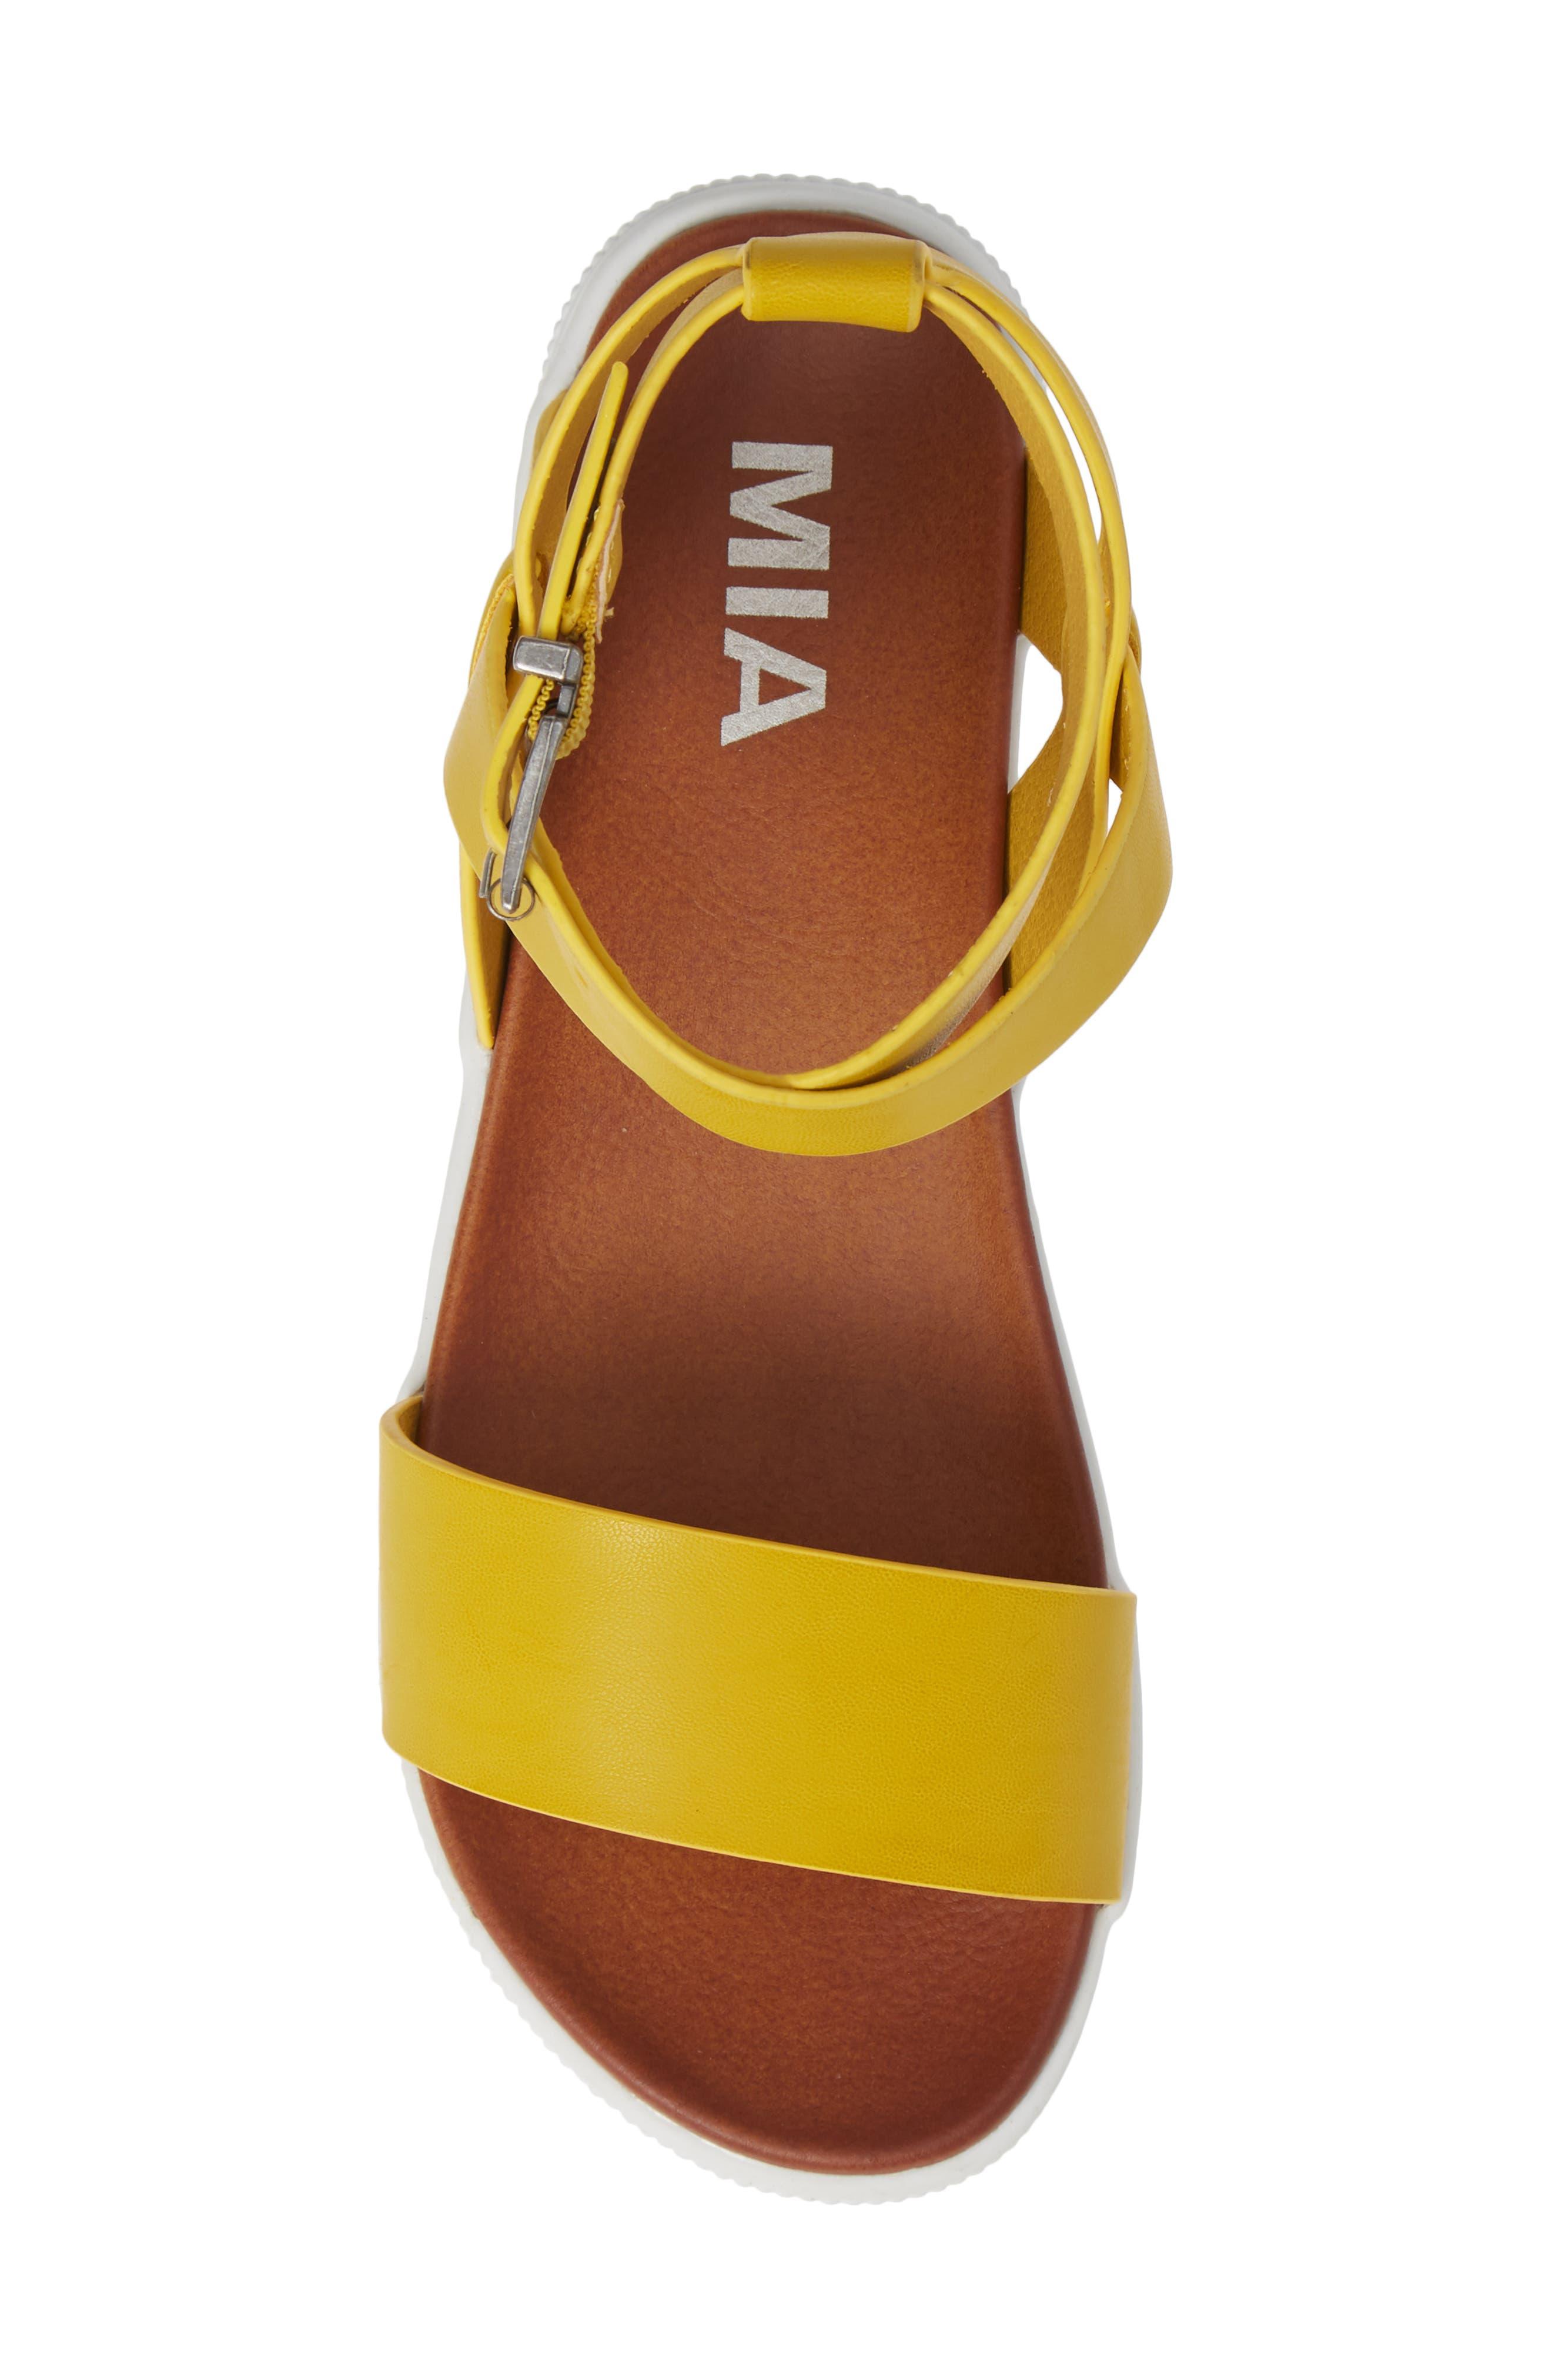 Calla Platform Sandal,                             Alternate thumbnail 5, color,                             YELLOW FAUX LEATHER